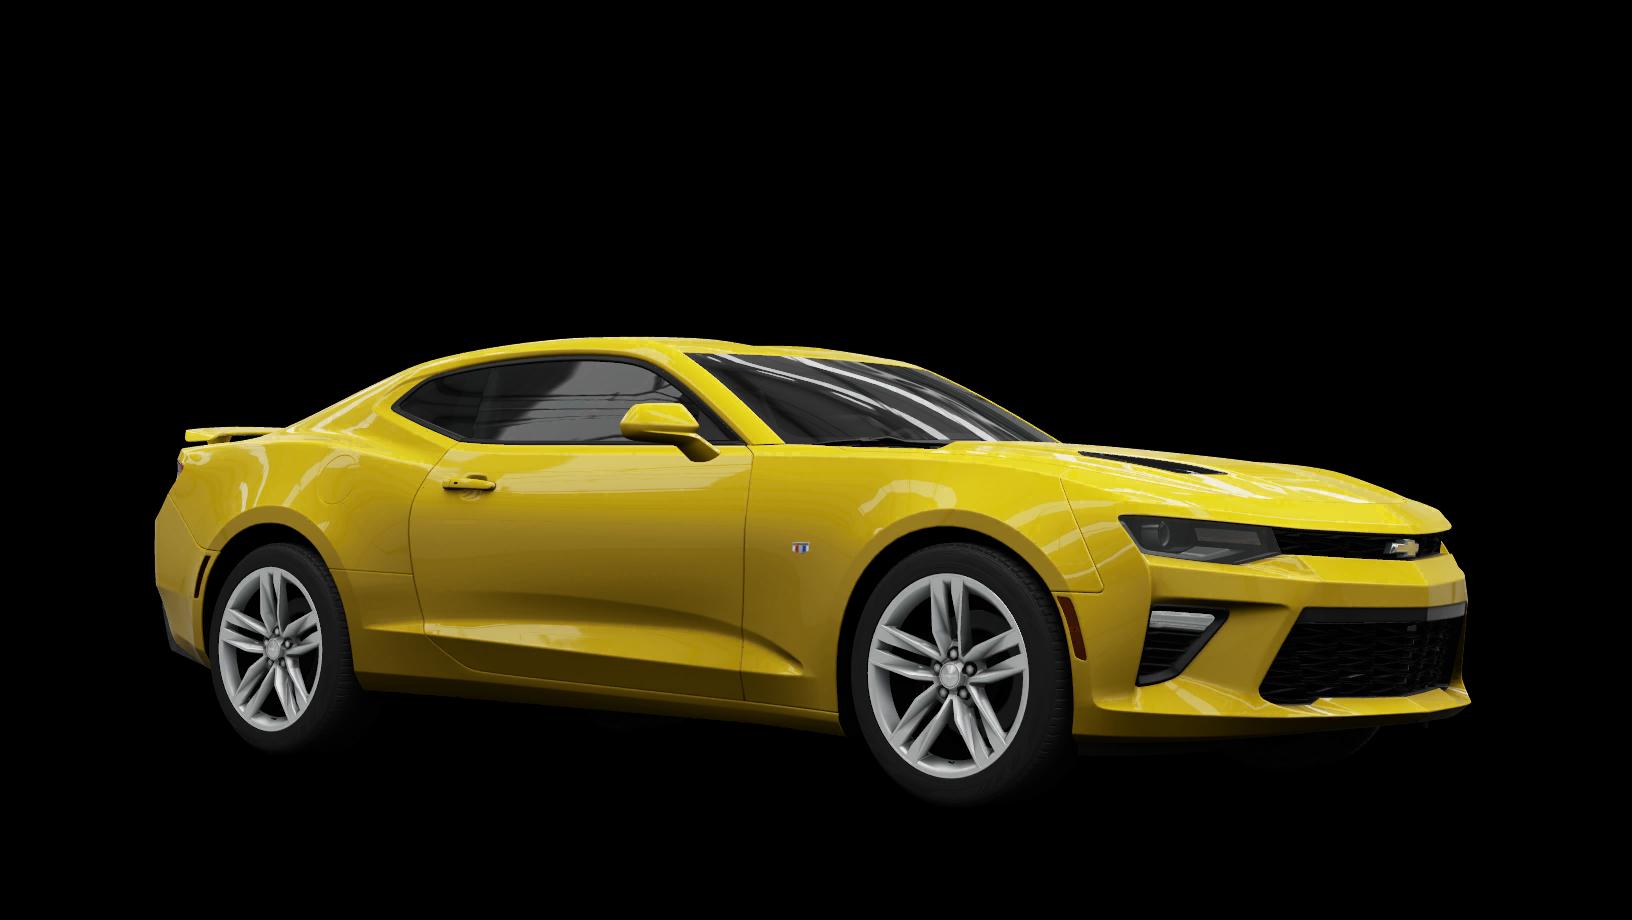 Chevrolet Camaro Super Sport (2016)